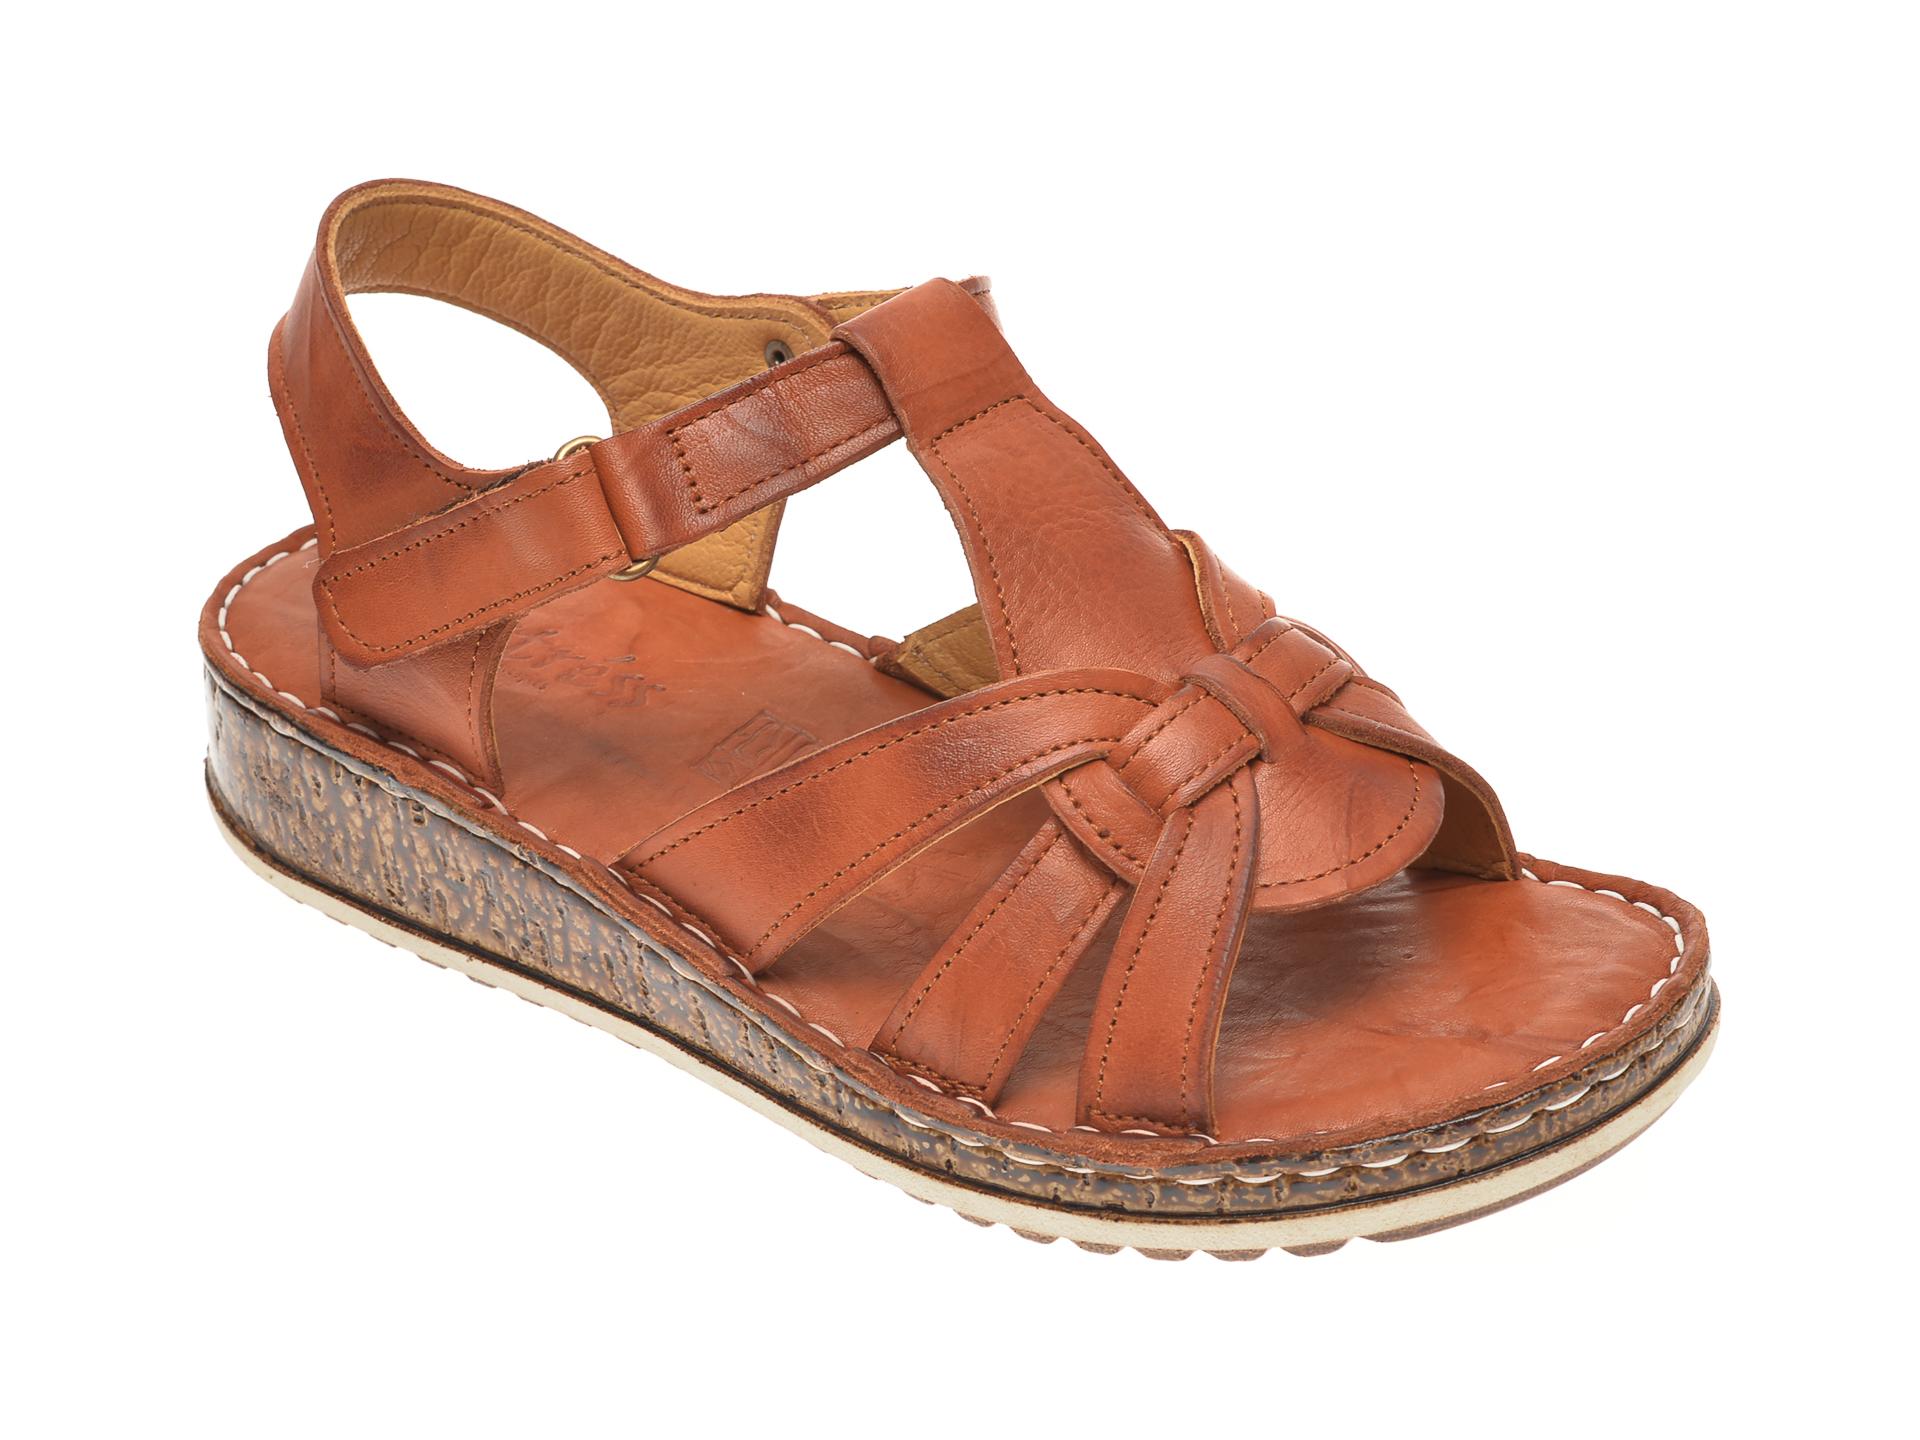 Sandale SINESTRESS maro, 1370, din piele naturala